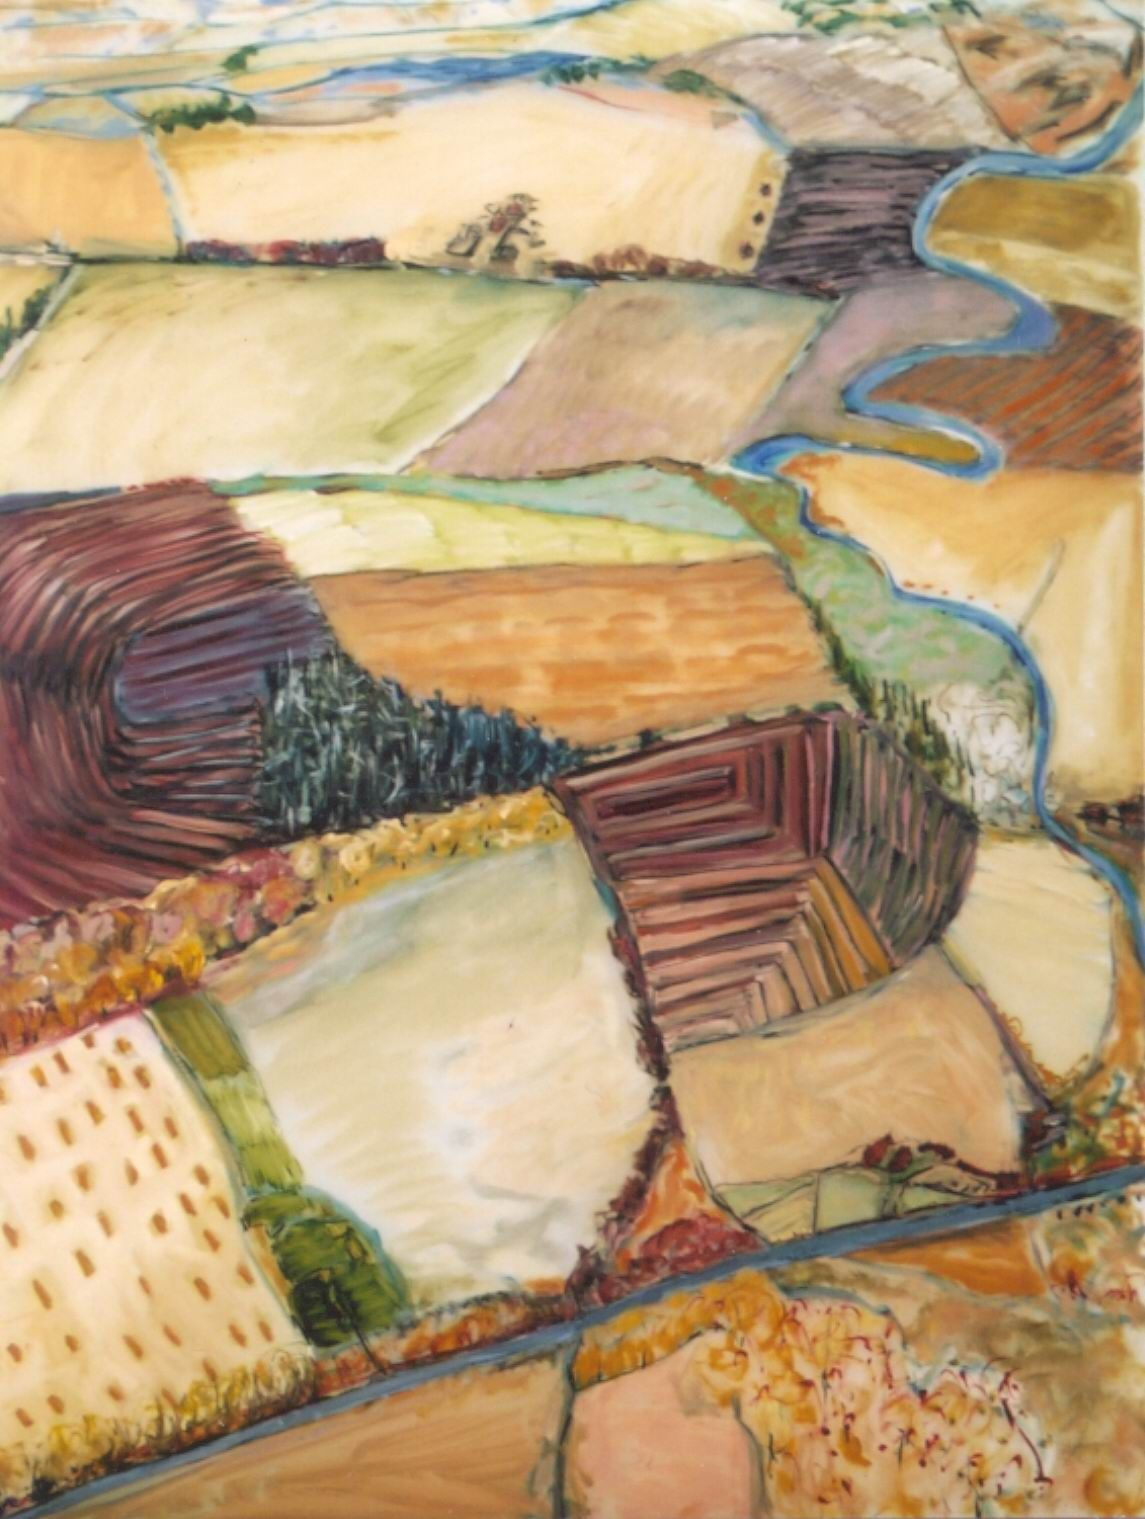 Lexan Over Looking the Crops oil on lexan 48x65.jpg